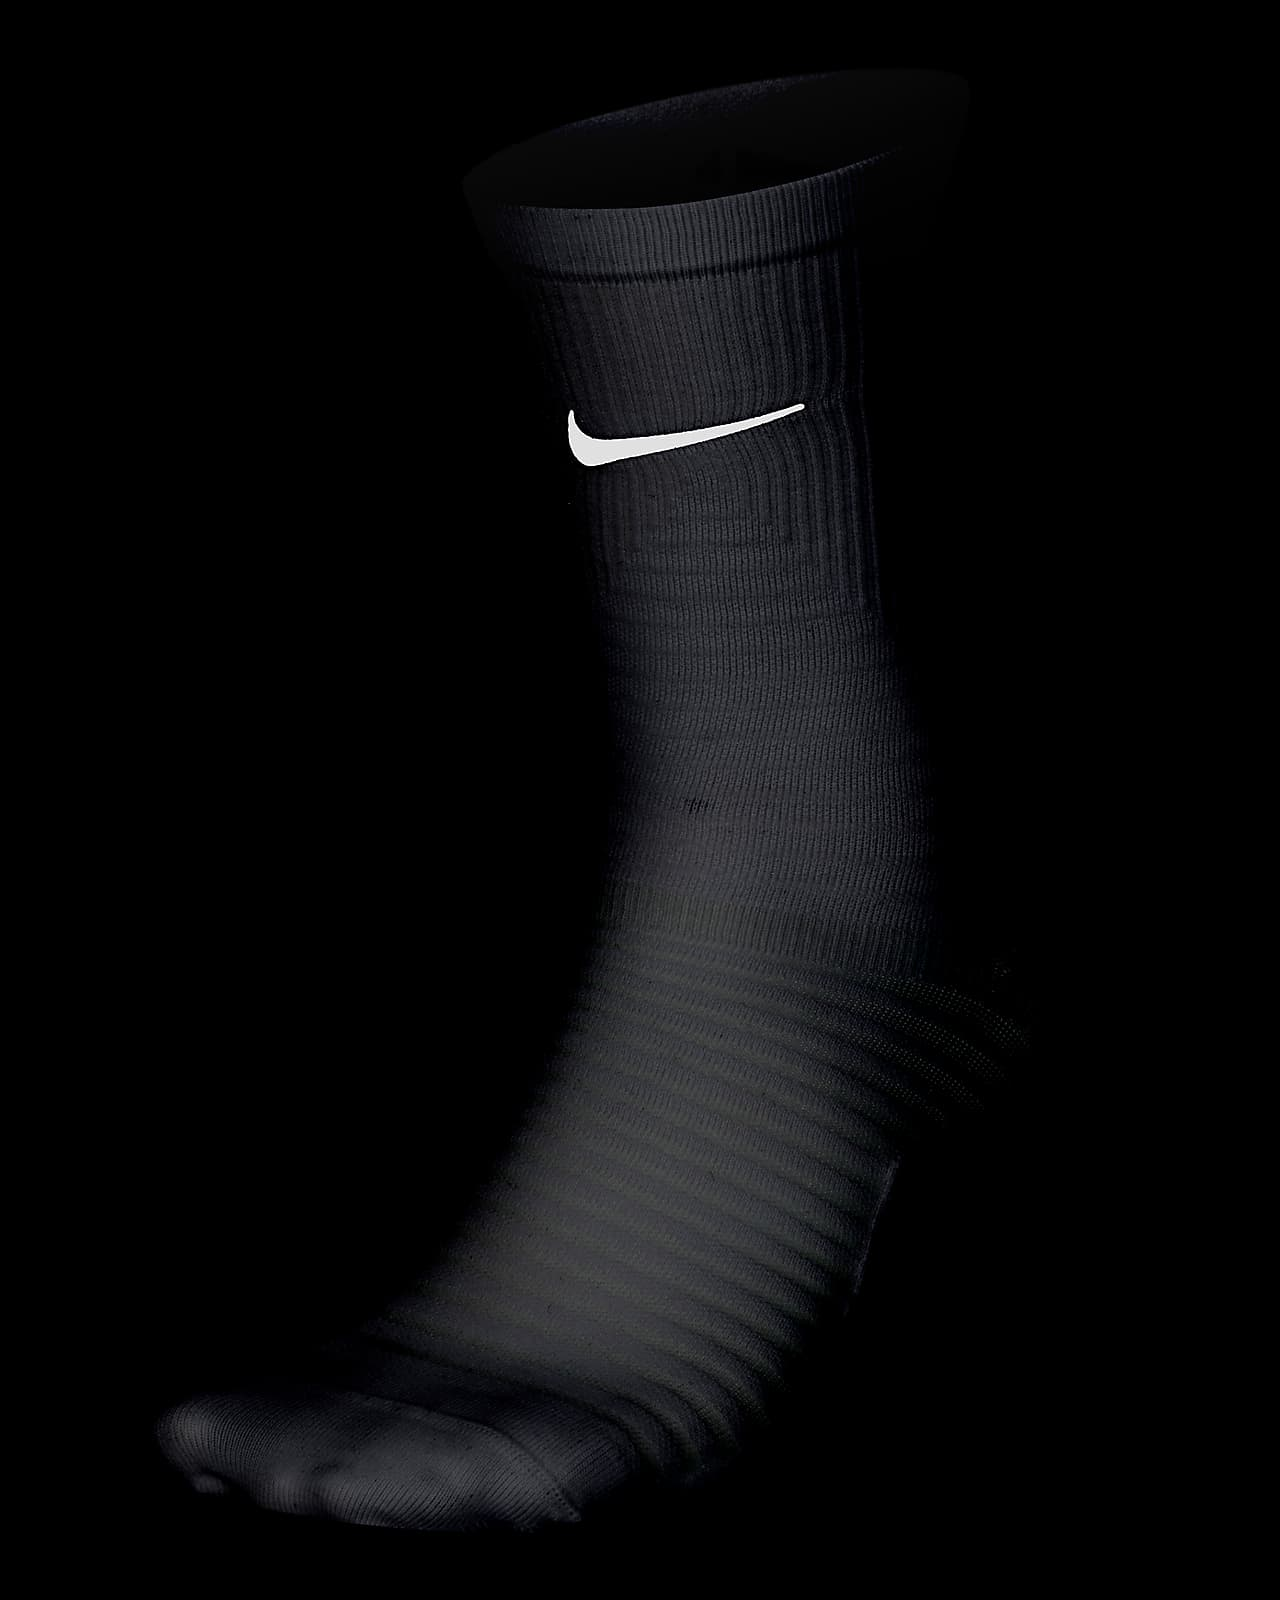 sock nike shoes